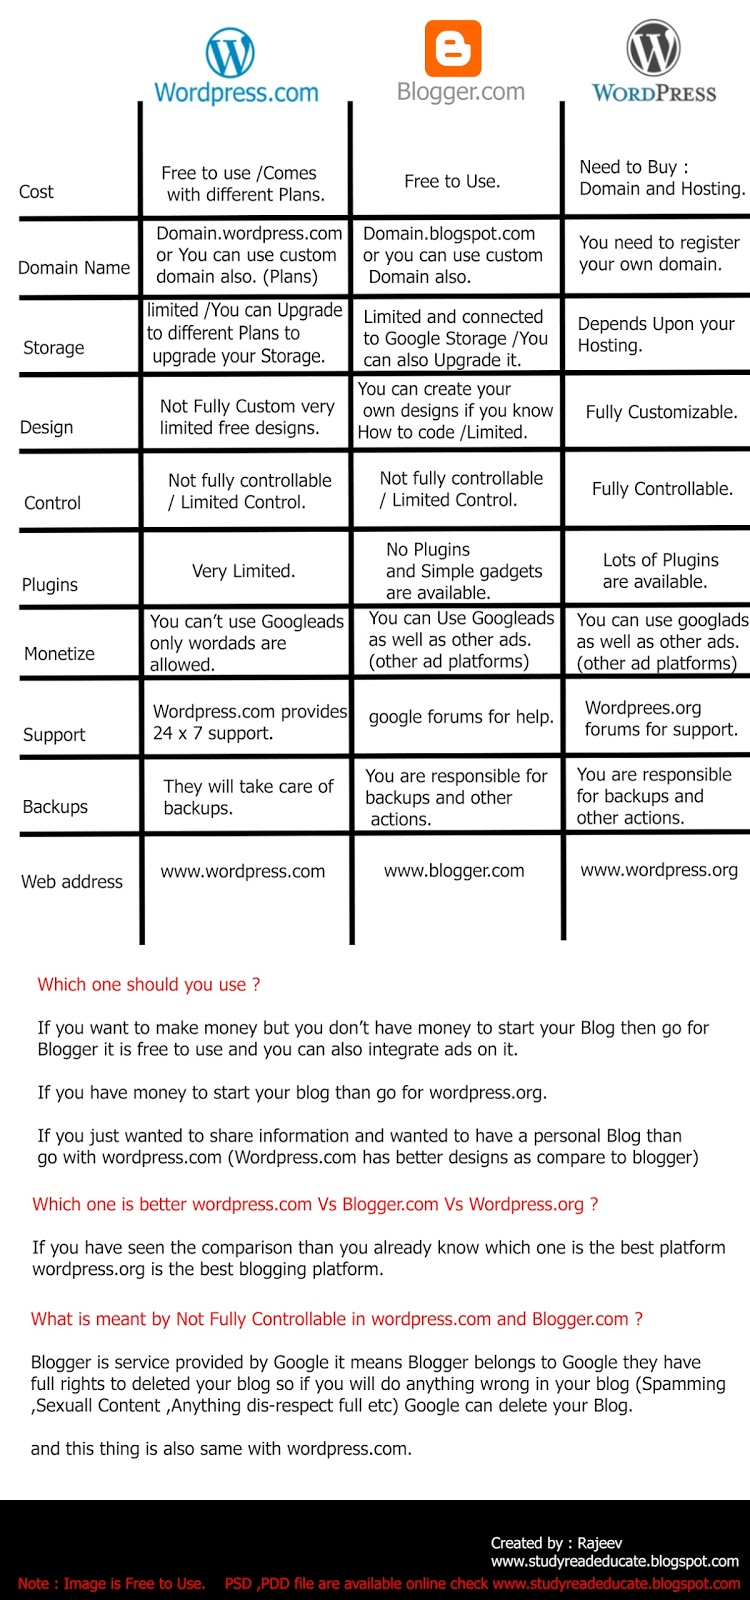 Wordpress blogger difference image